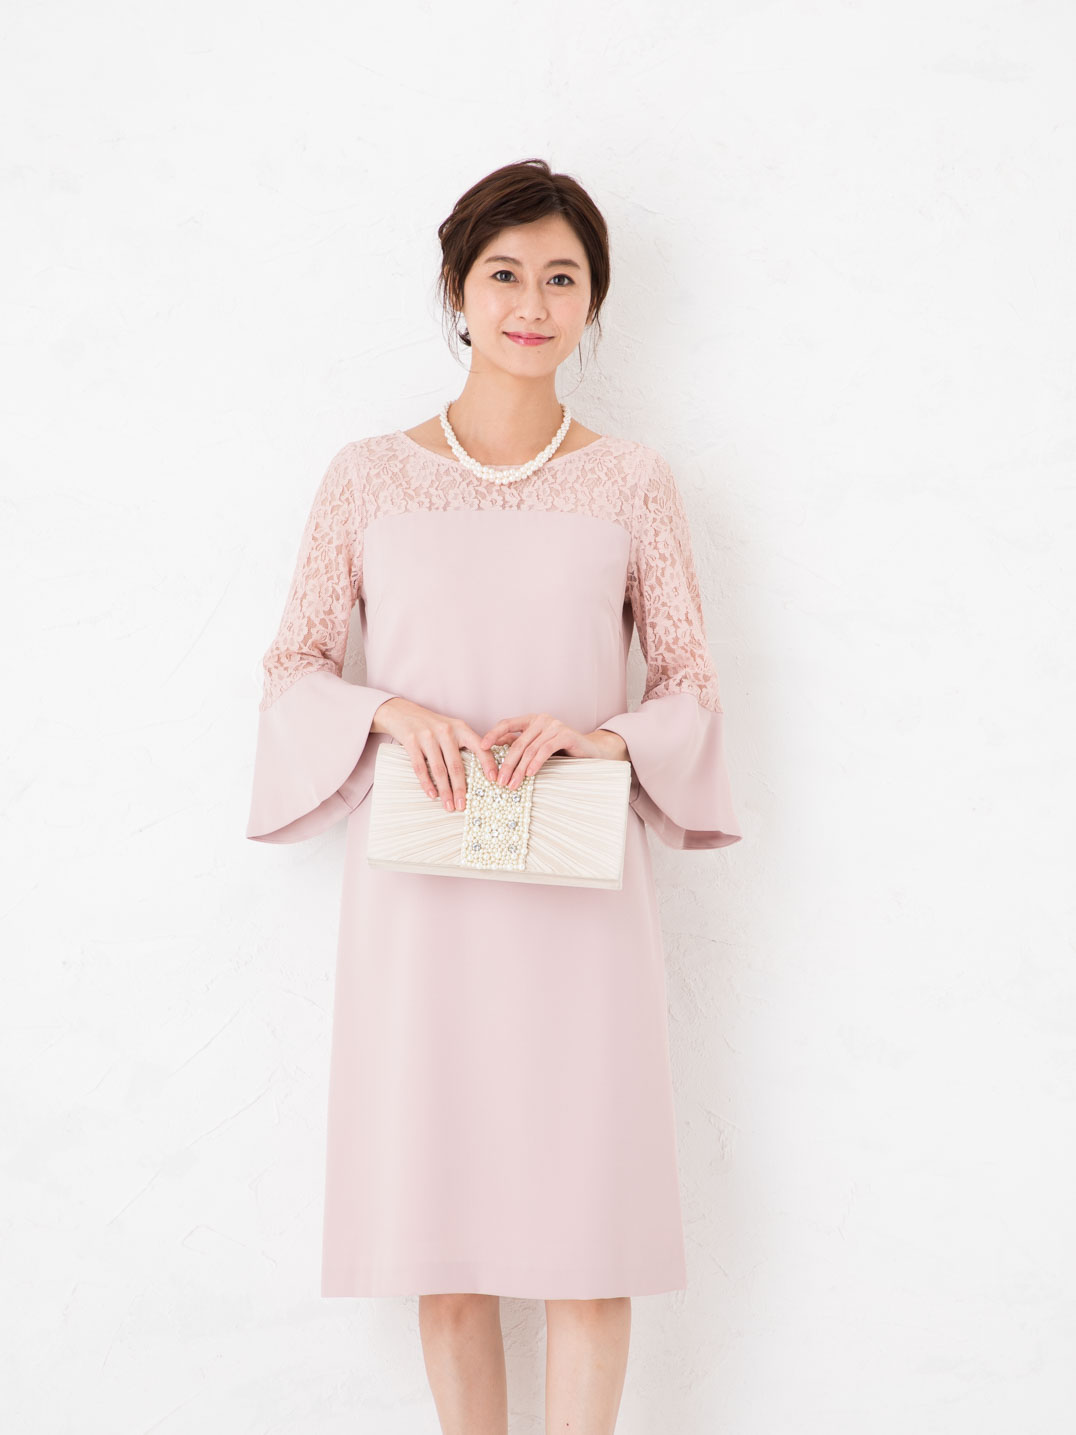 Je super ドレス / Mサイズ (DOC0151)